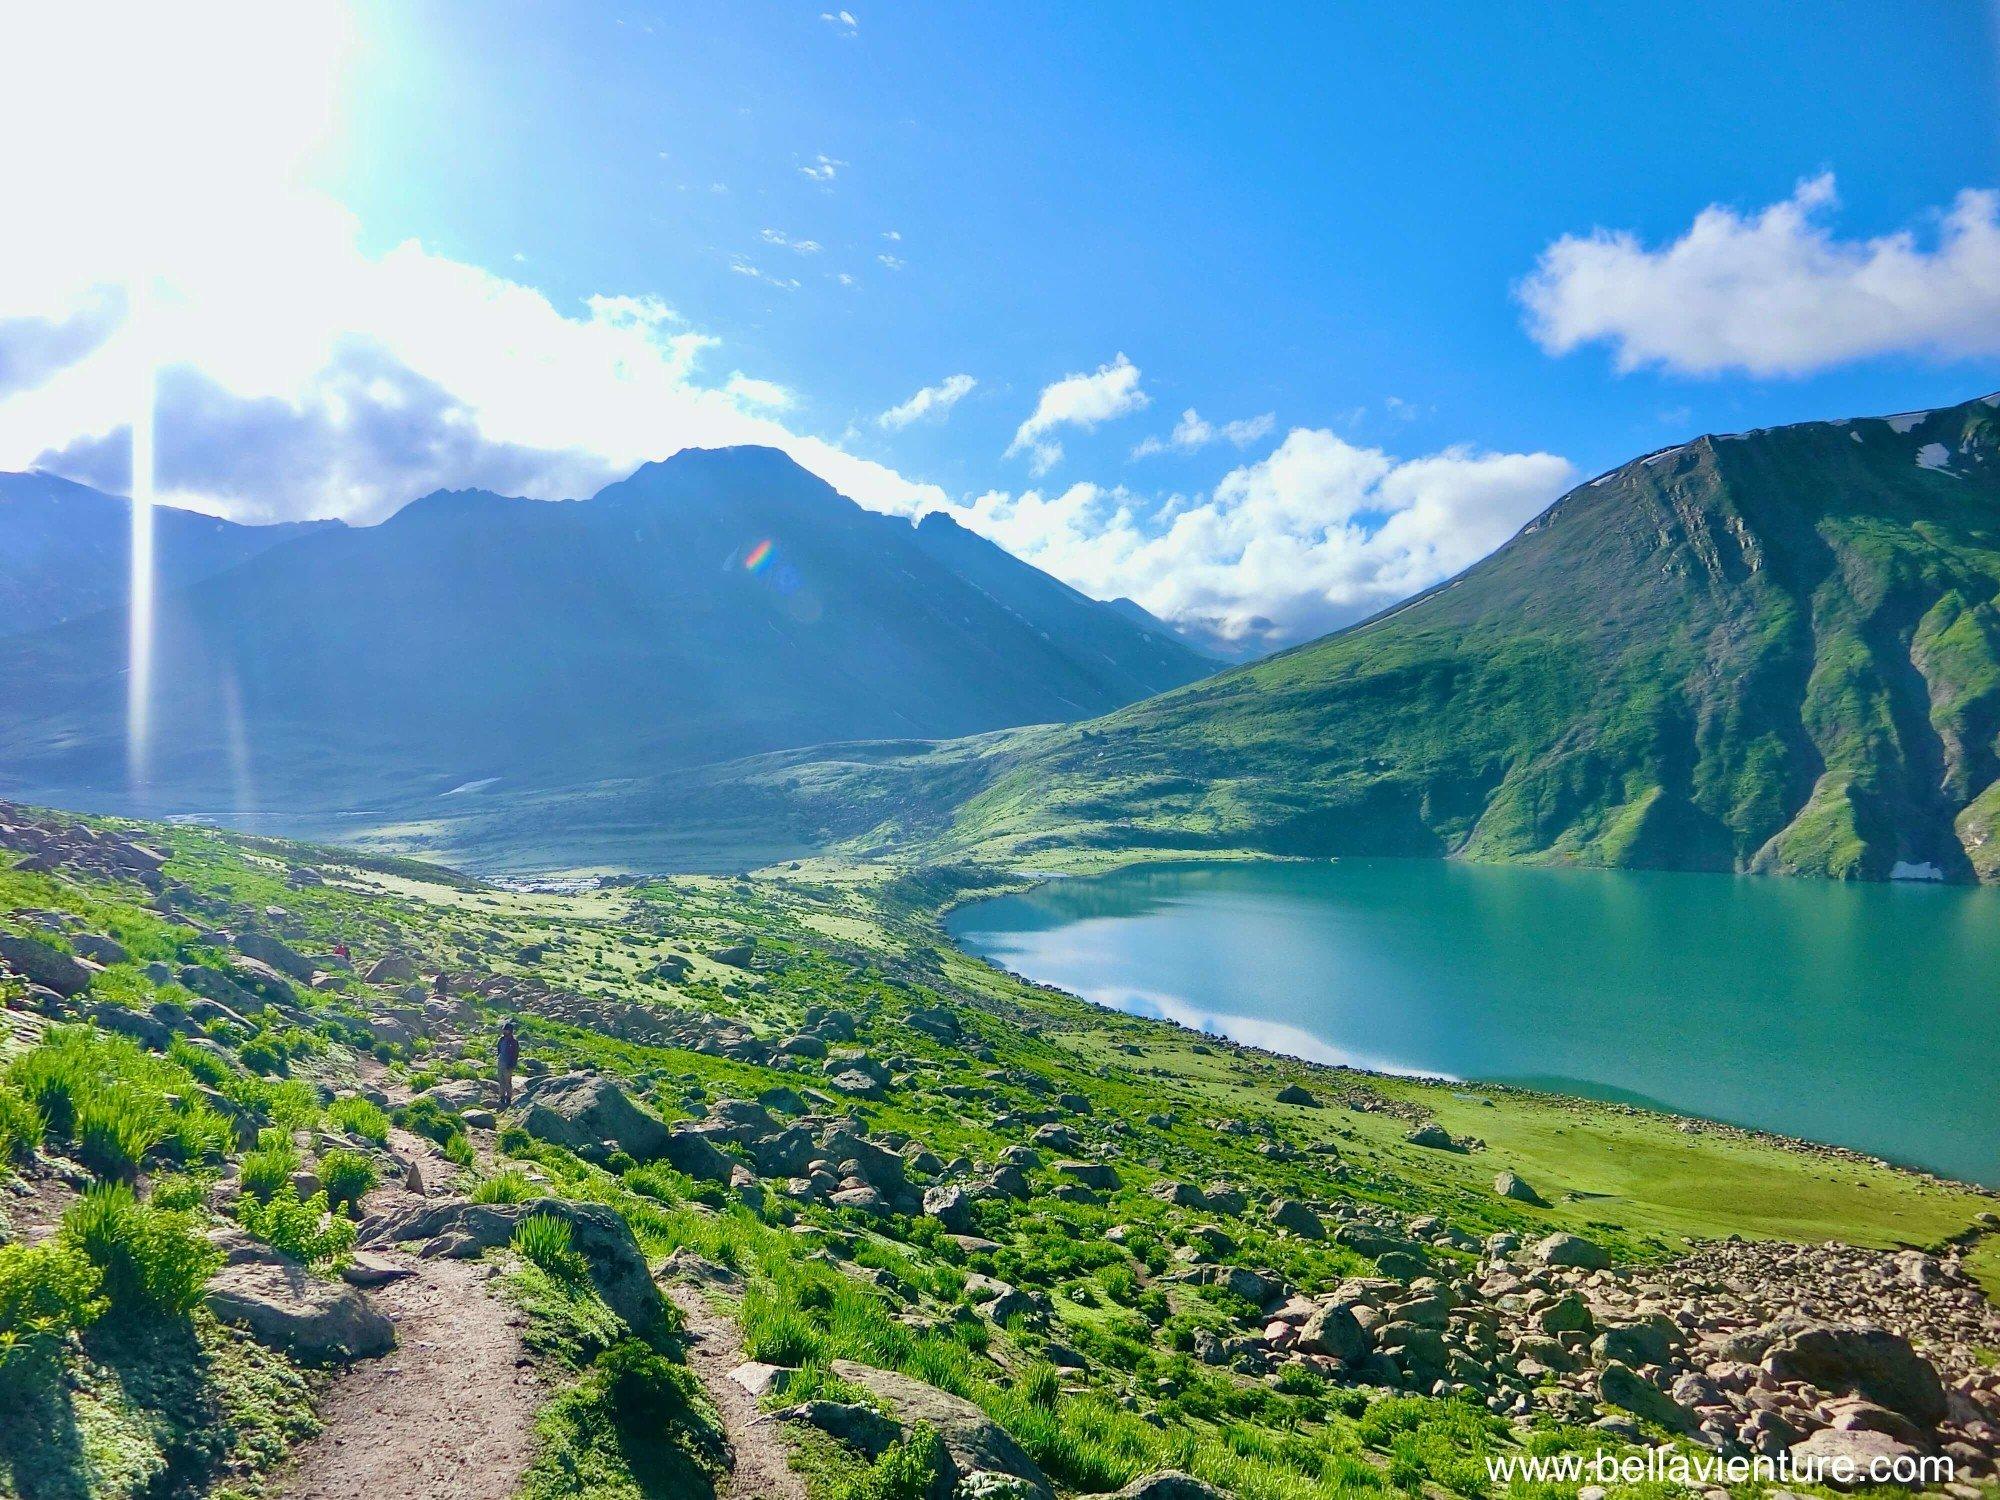 印度India 北北印North Inida  喀什米爾Kashmir 健行Trekking 湖泊